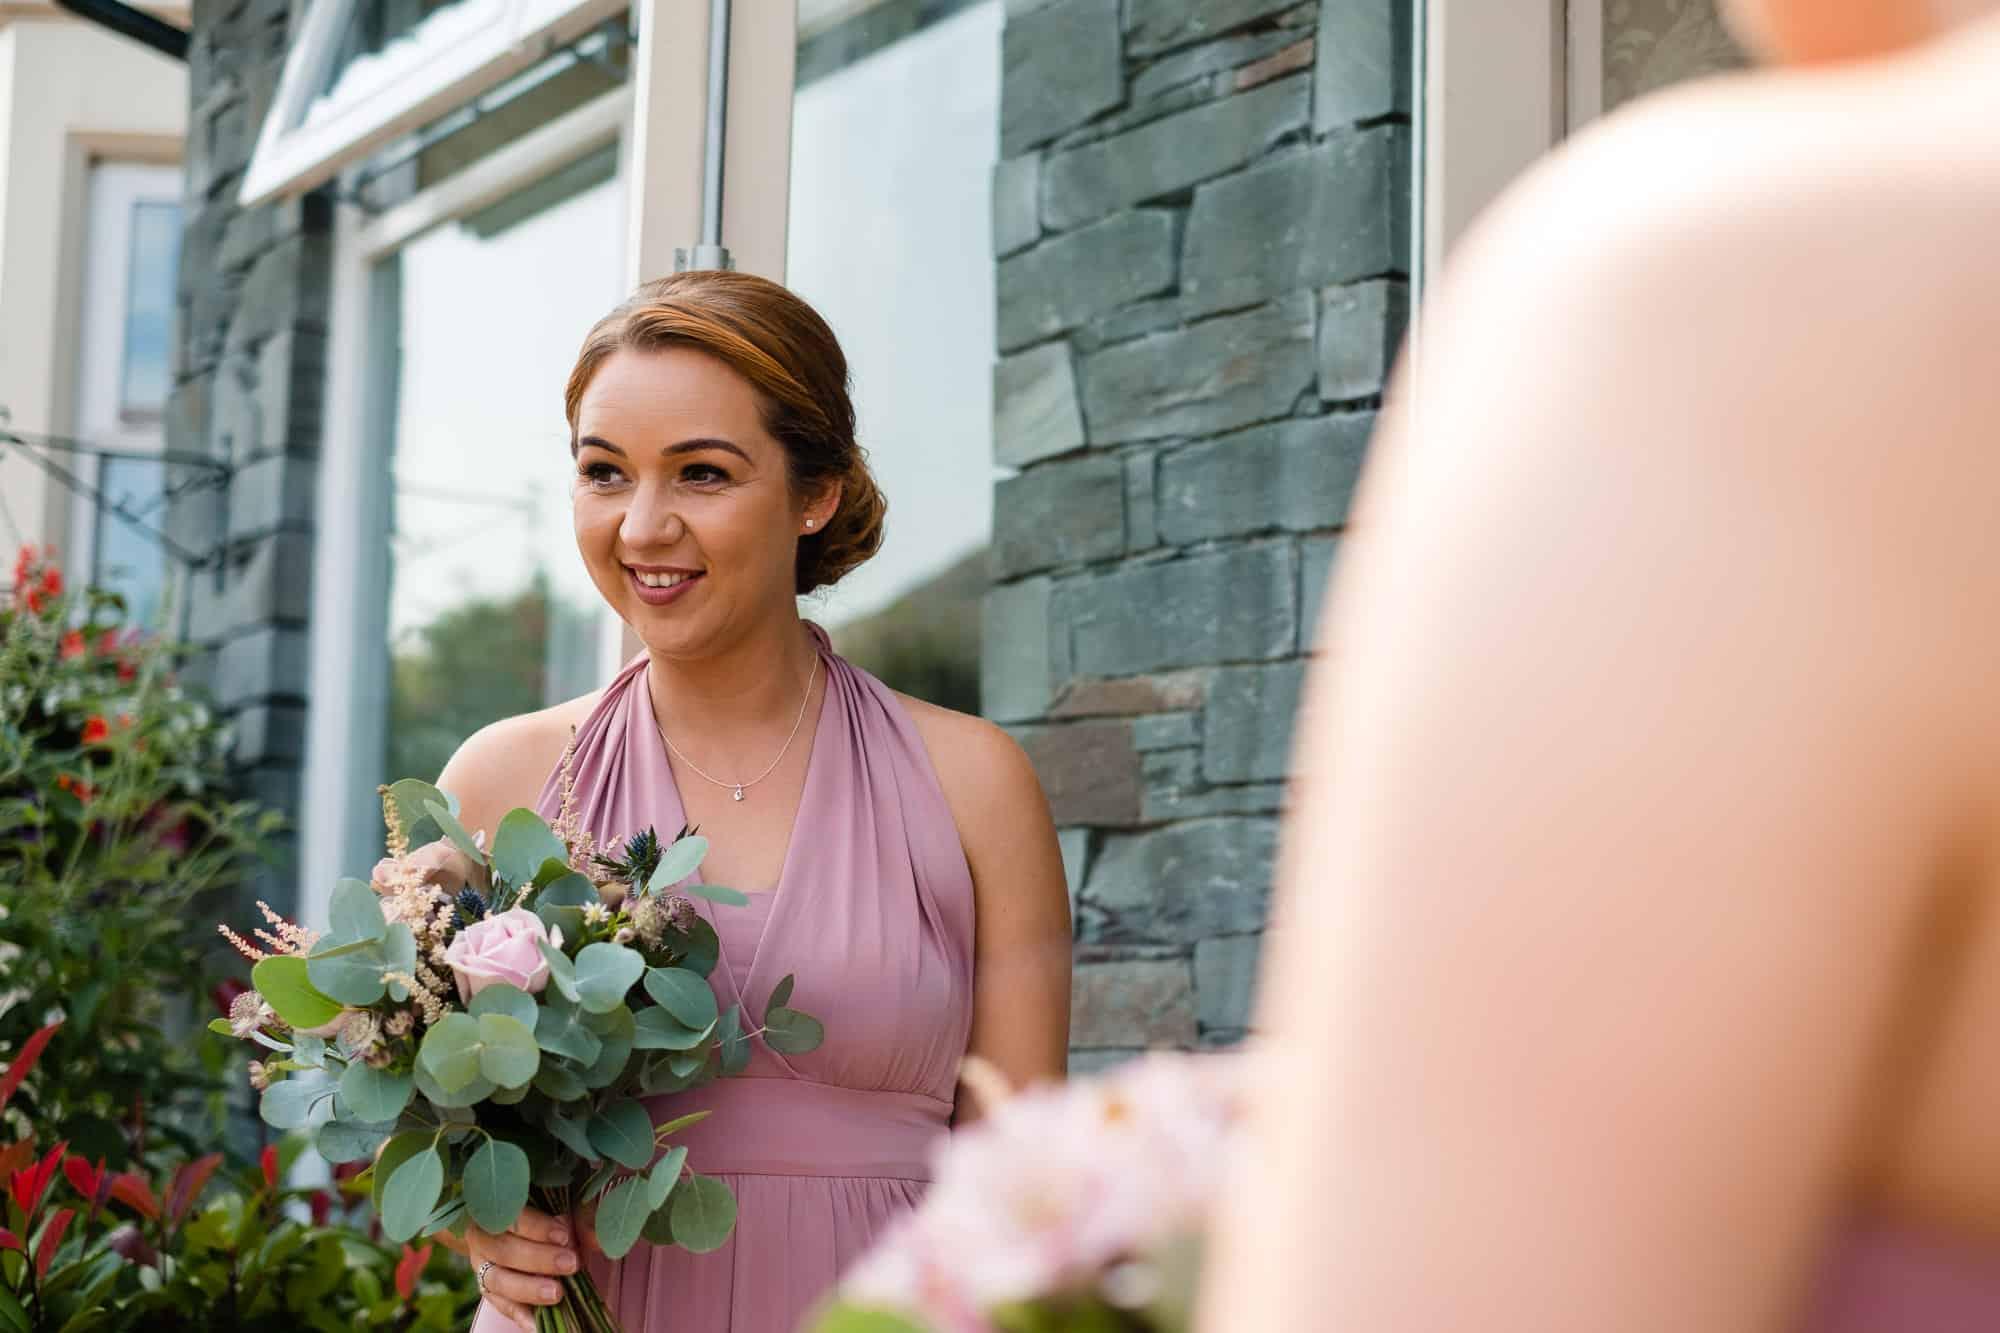 bridesmaid smiling holding bouquet